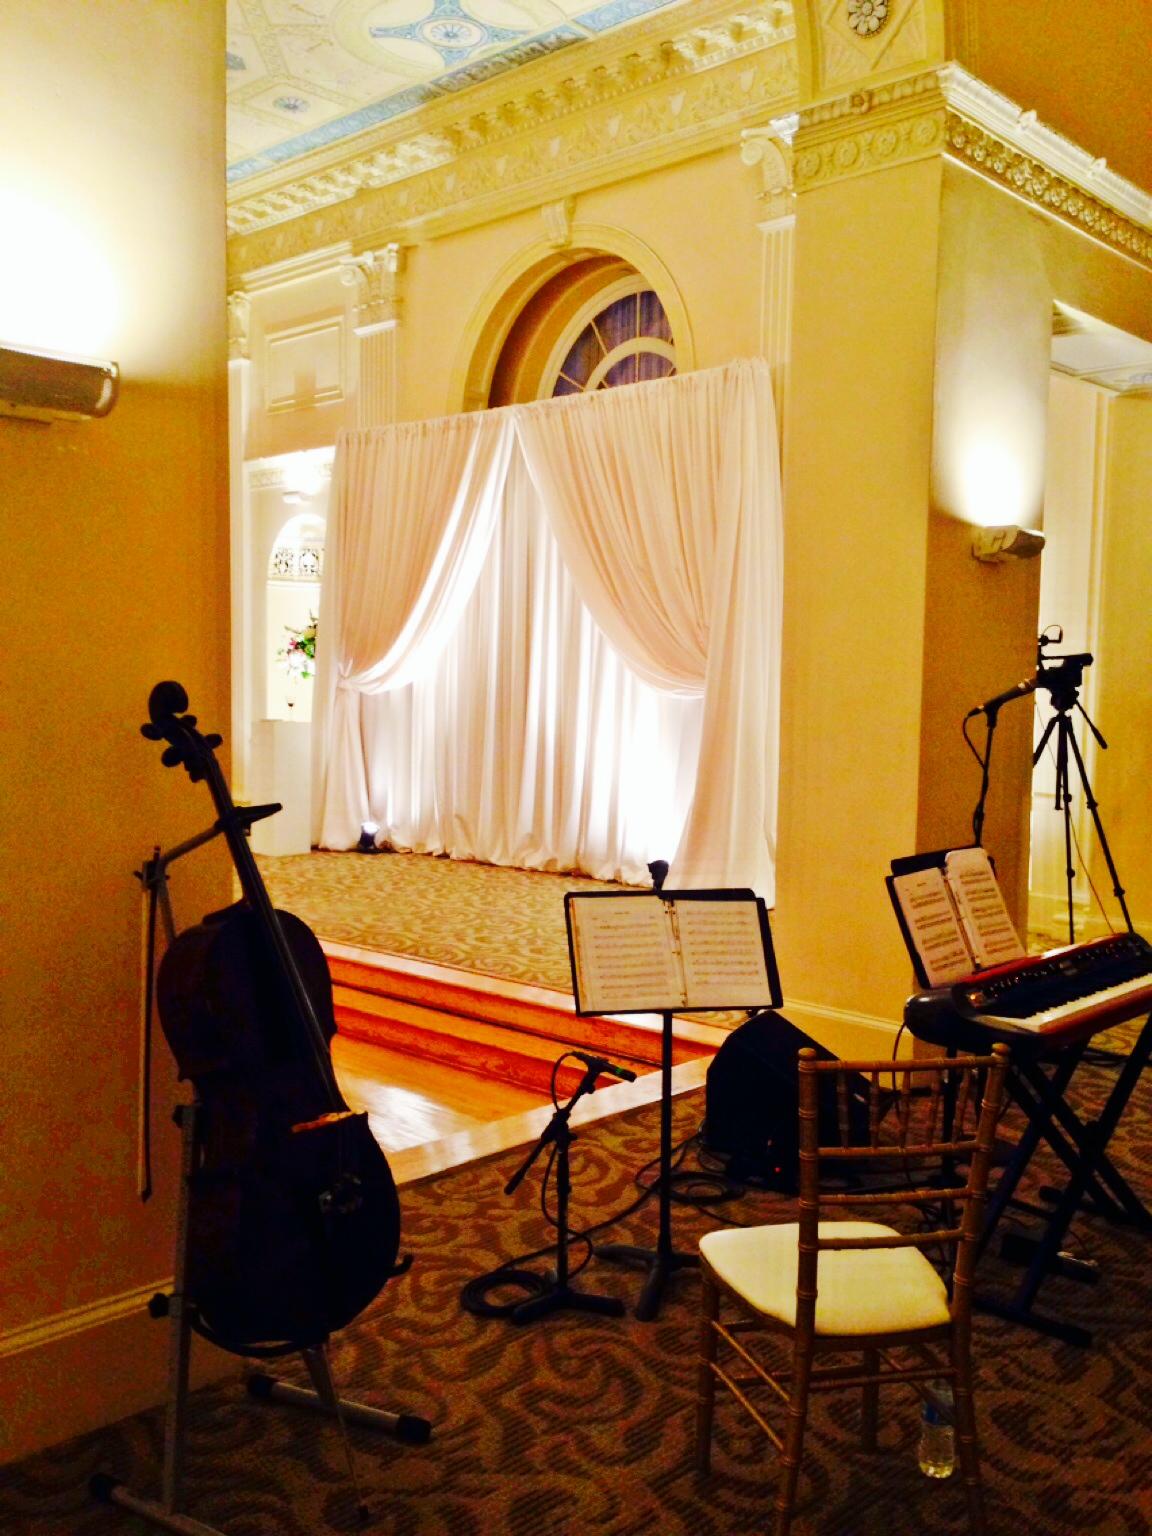 The Biltmore Ballroom